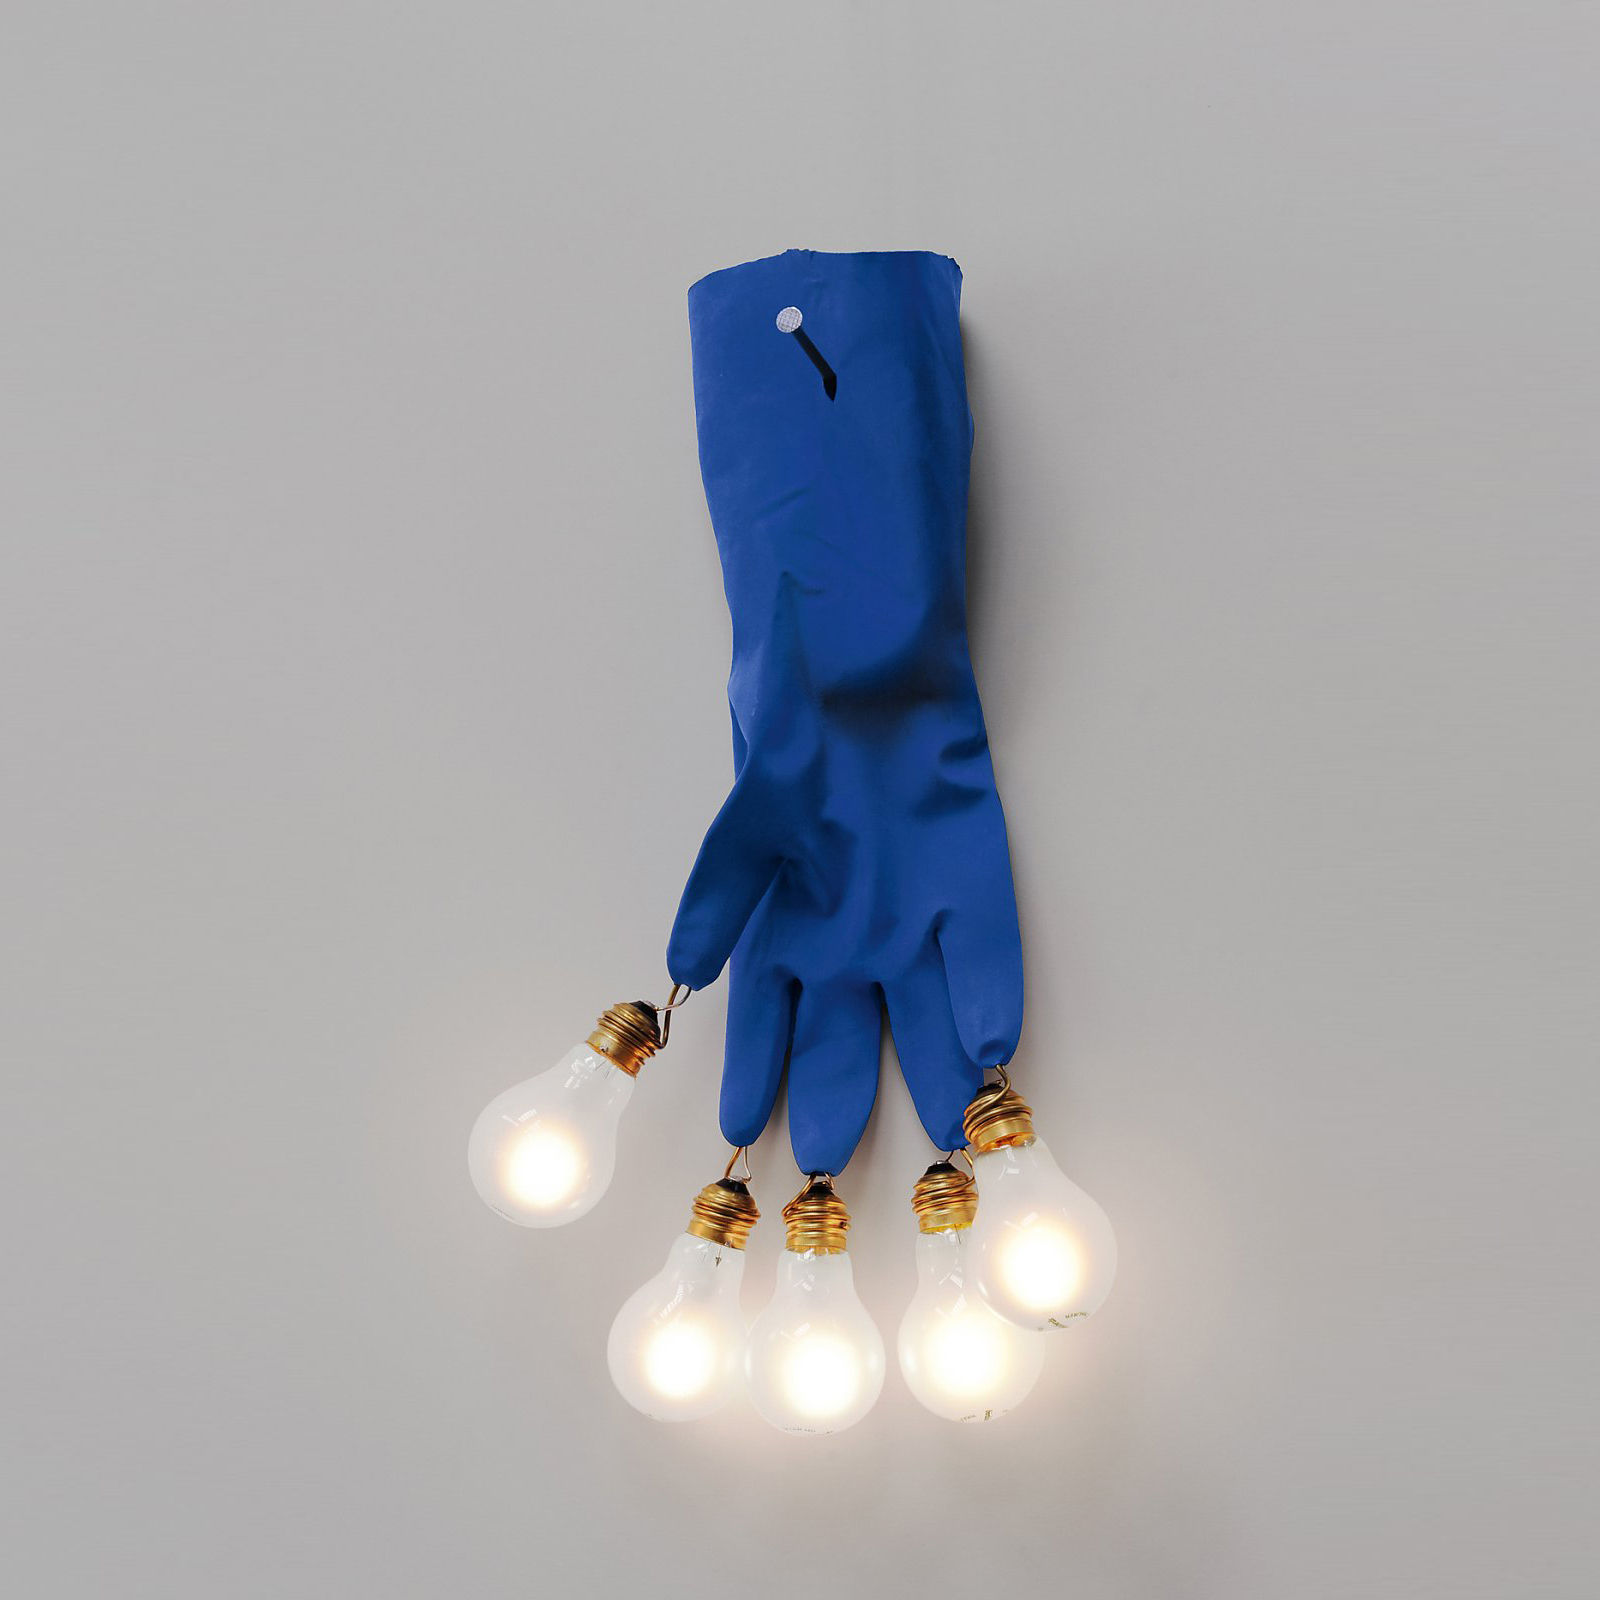 Lighting - Wall Lights - Luzy on the Wall Wall light with plug - / LED - 5 bulbs by Ingo Maurer - Blue - Brass, Glass, High-resistance plastic, Steel